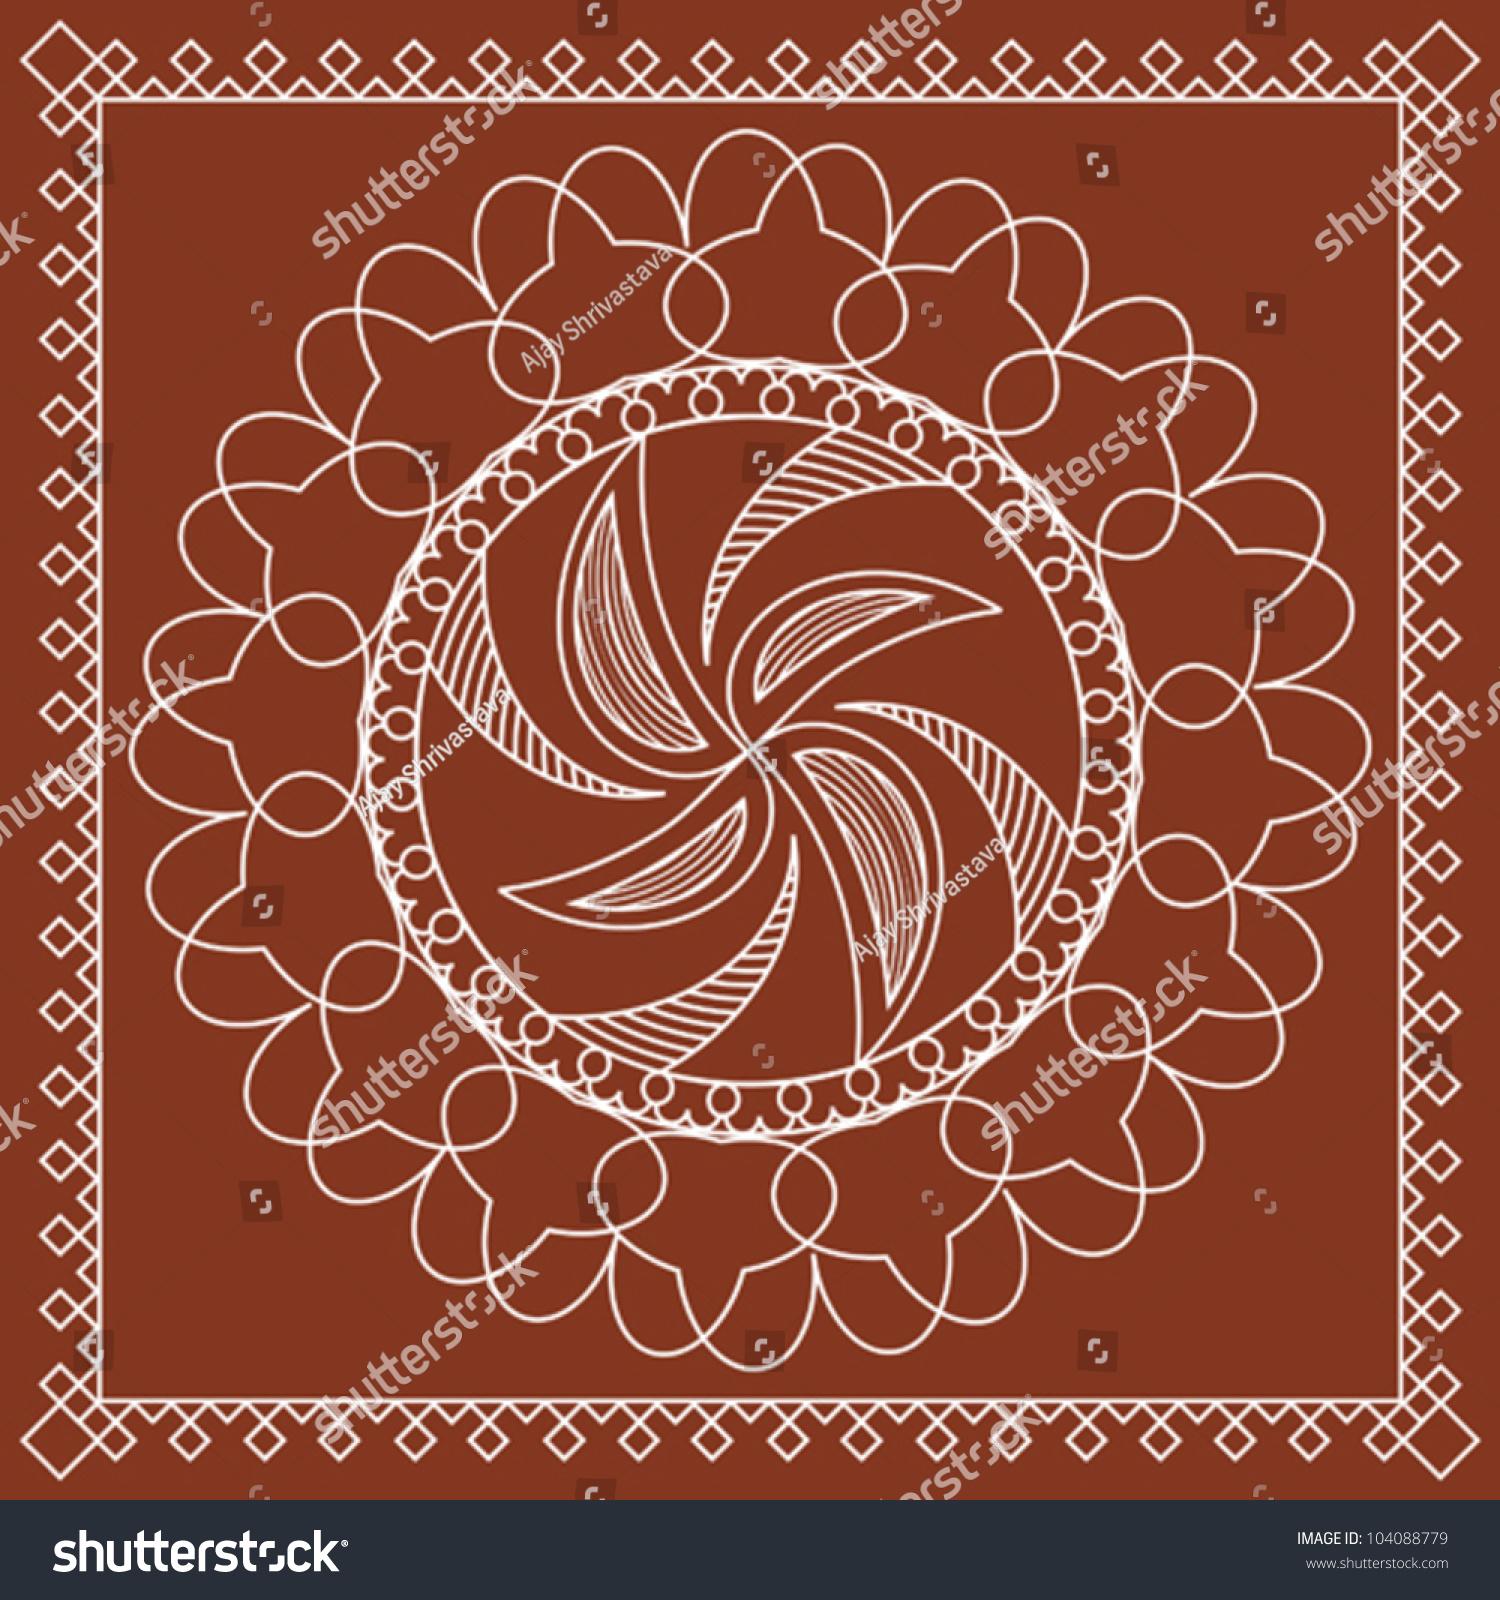 tribal folk motif design wall painting stock vector illustration 104088779 shutterstock. Black Bedroom Furniture Sets. Home Design Ideas